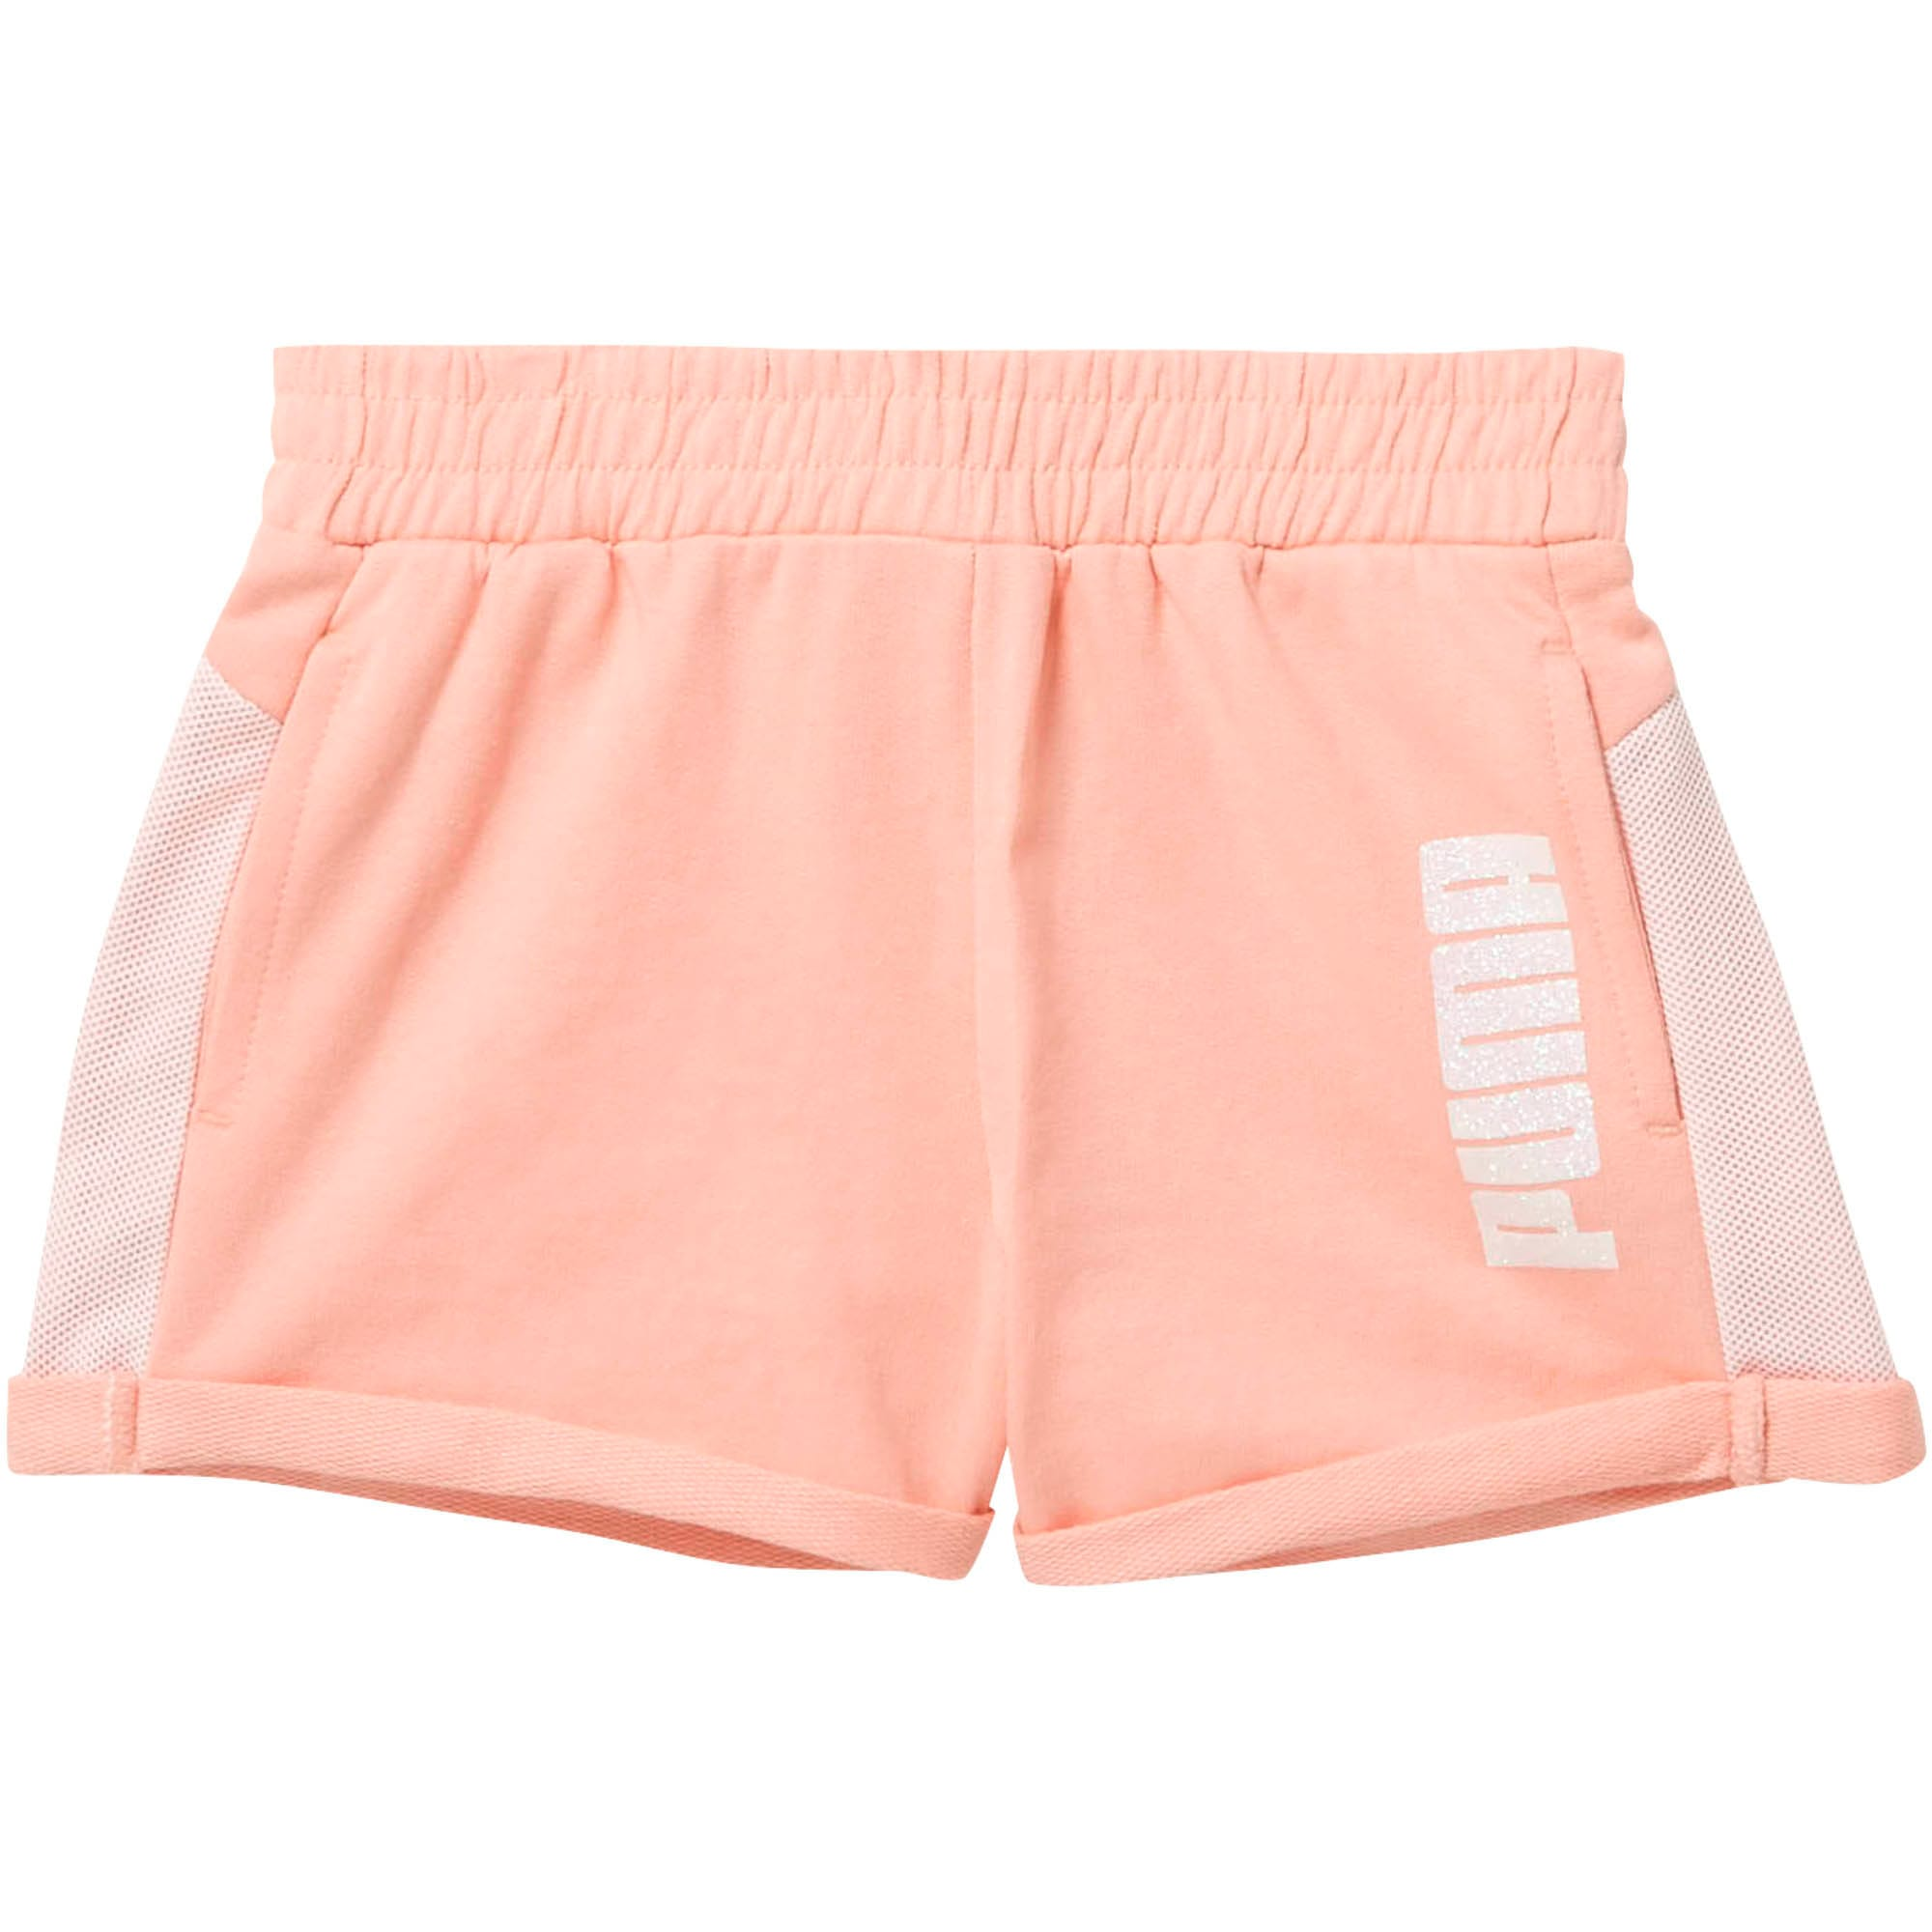 Thumbnail 1 of Little Kids' Cotton Terry Mesh Fashion Shorts, PEACH BUD, medium